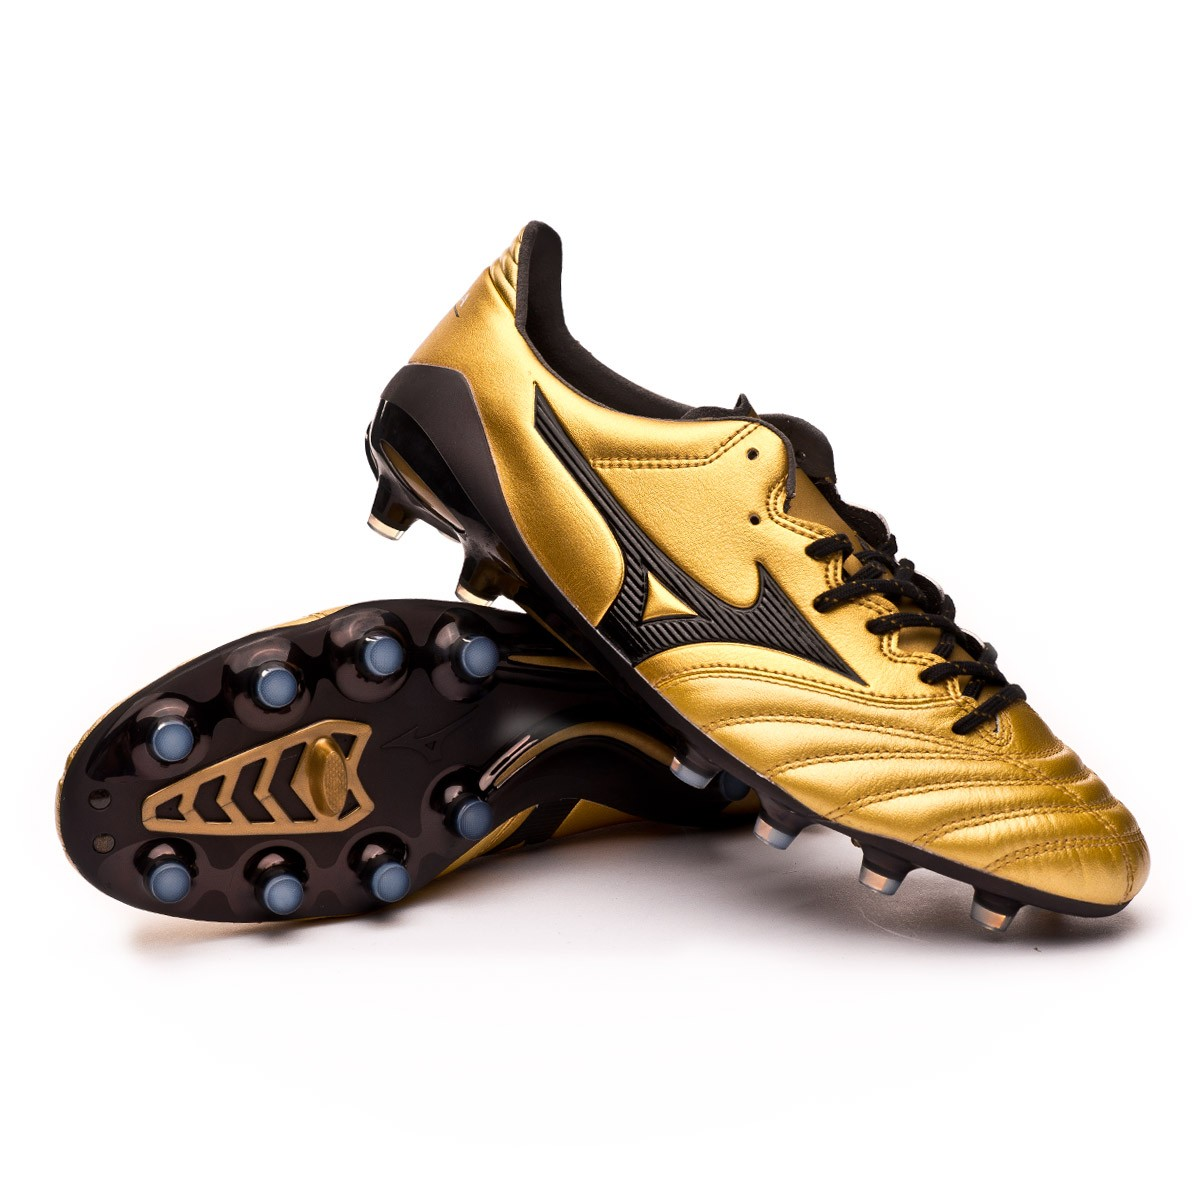 Boot Mizuno Morelia NEO II MD Gold-Black - Leaked soccer 626b47d385304